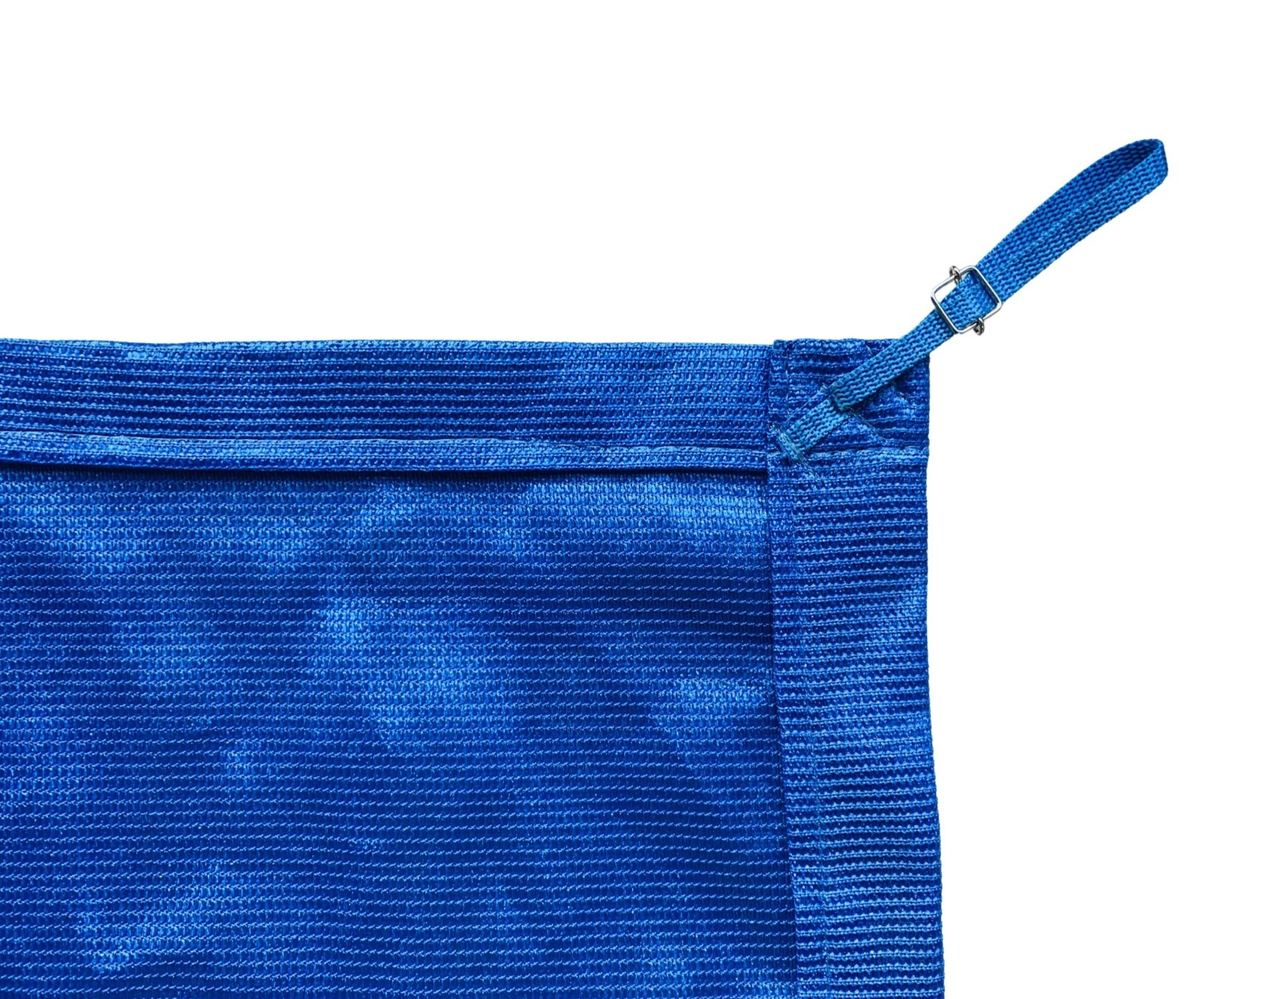 Tela de Sombreamento 90% Azul com Esticadores - Largura: 1,5 Metros